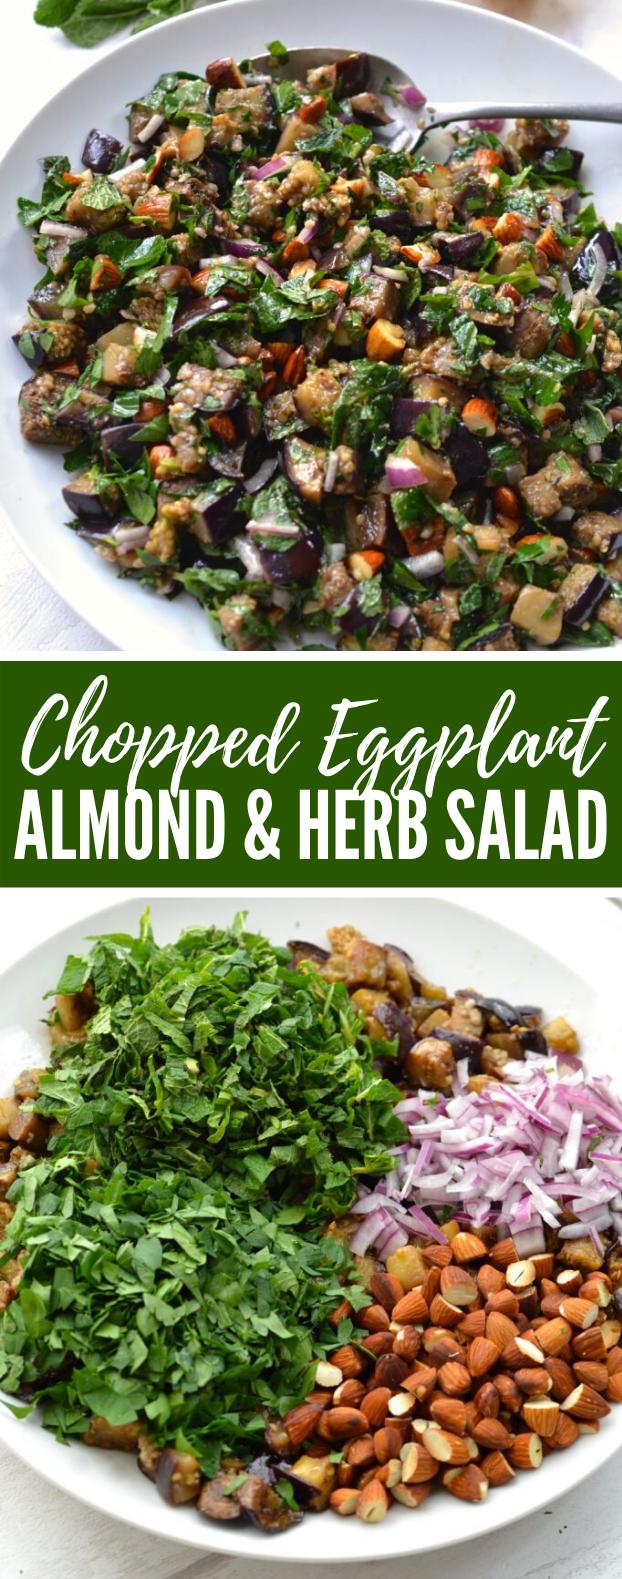 Chopped Eggplant, Almond & Herb Salad #vegan #healthy #salad #vegetables #veggies